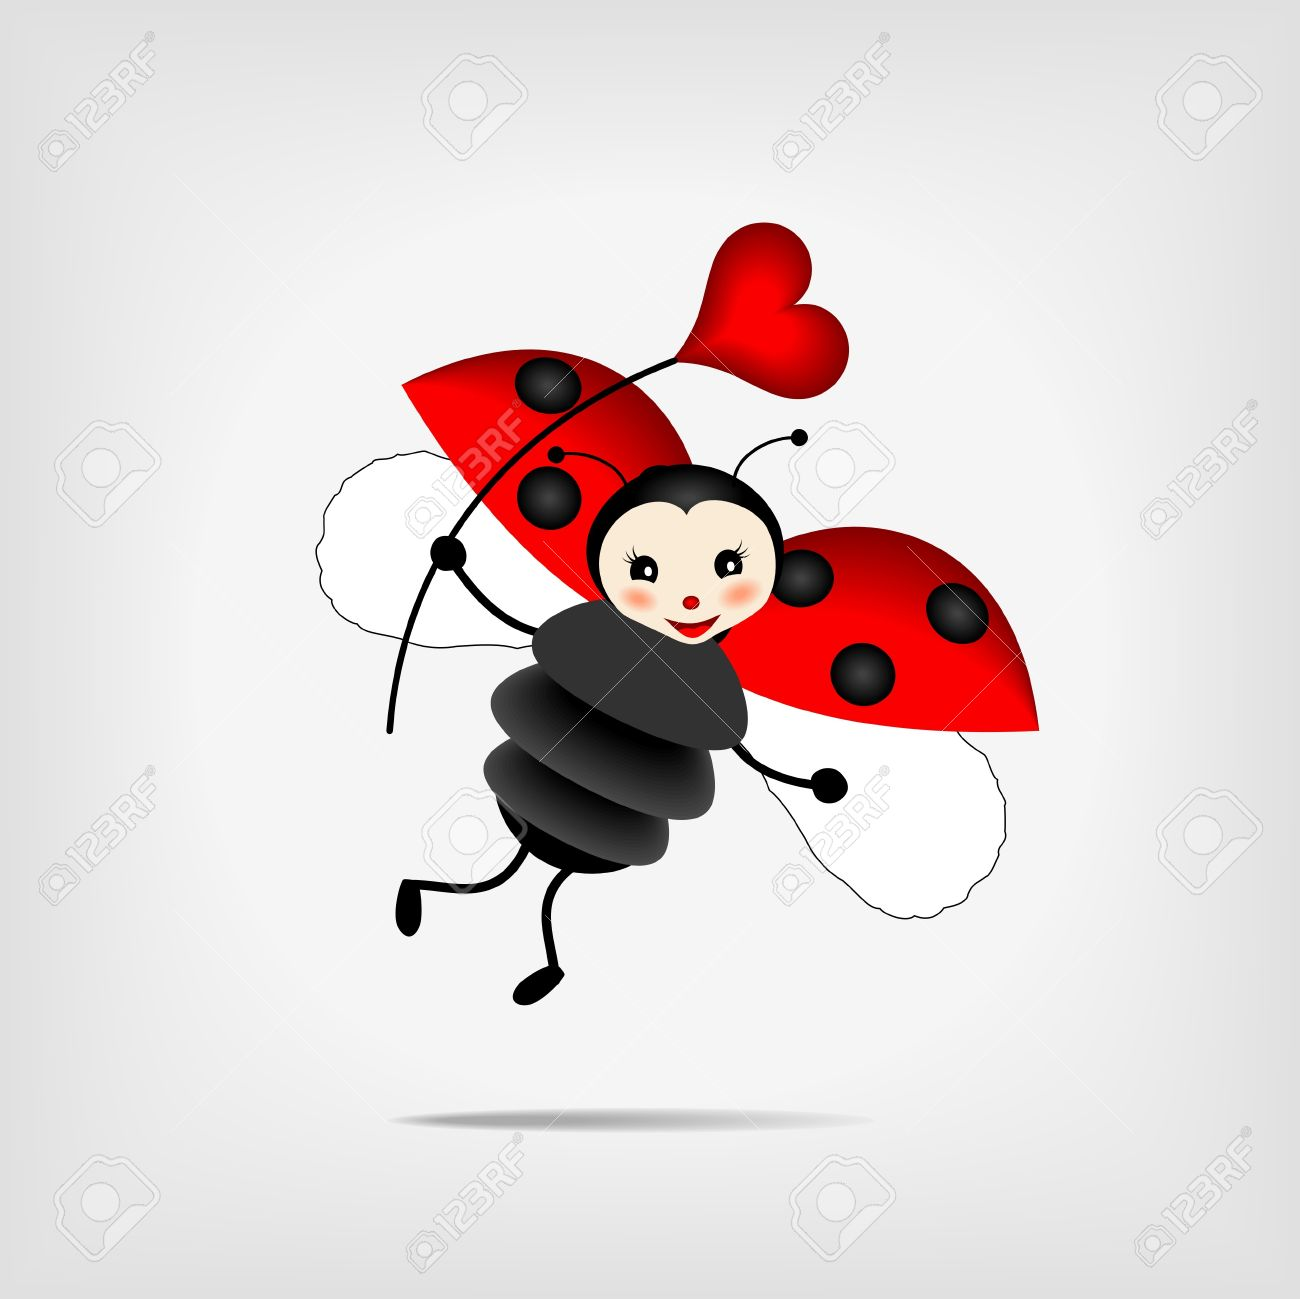 Ladybug Images & Stock Pictures. Royalty Free Ladybug Photos And ...